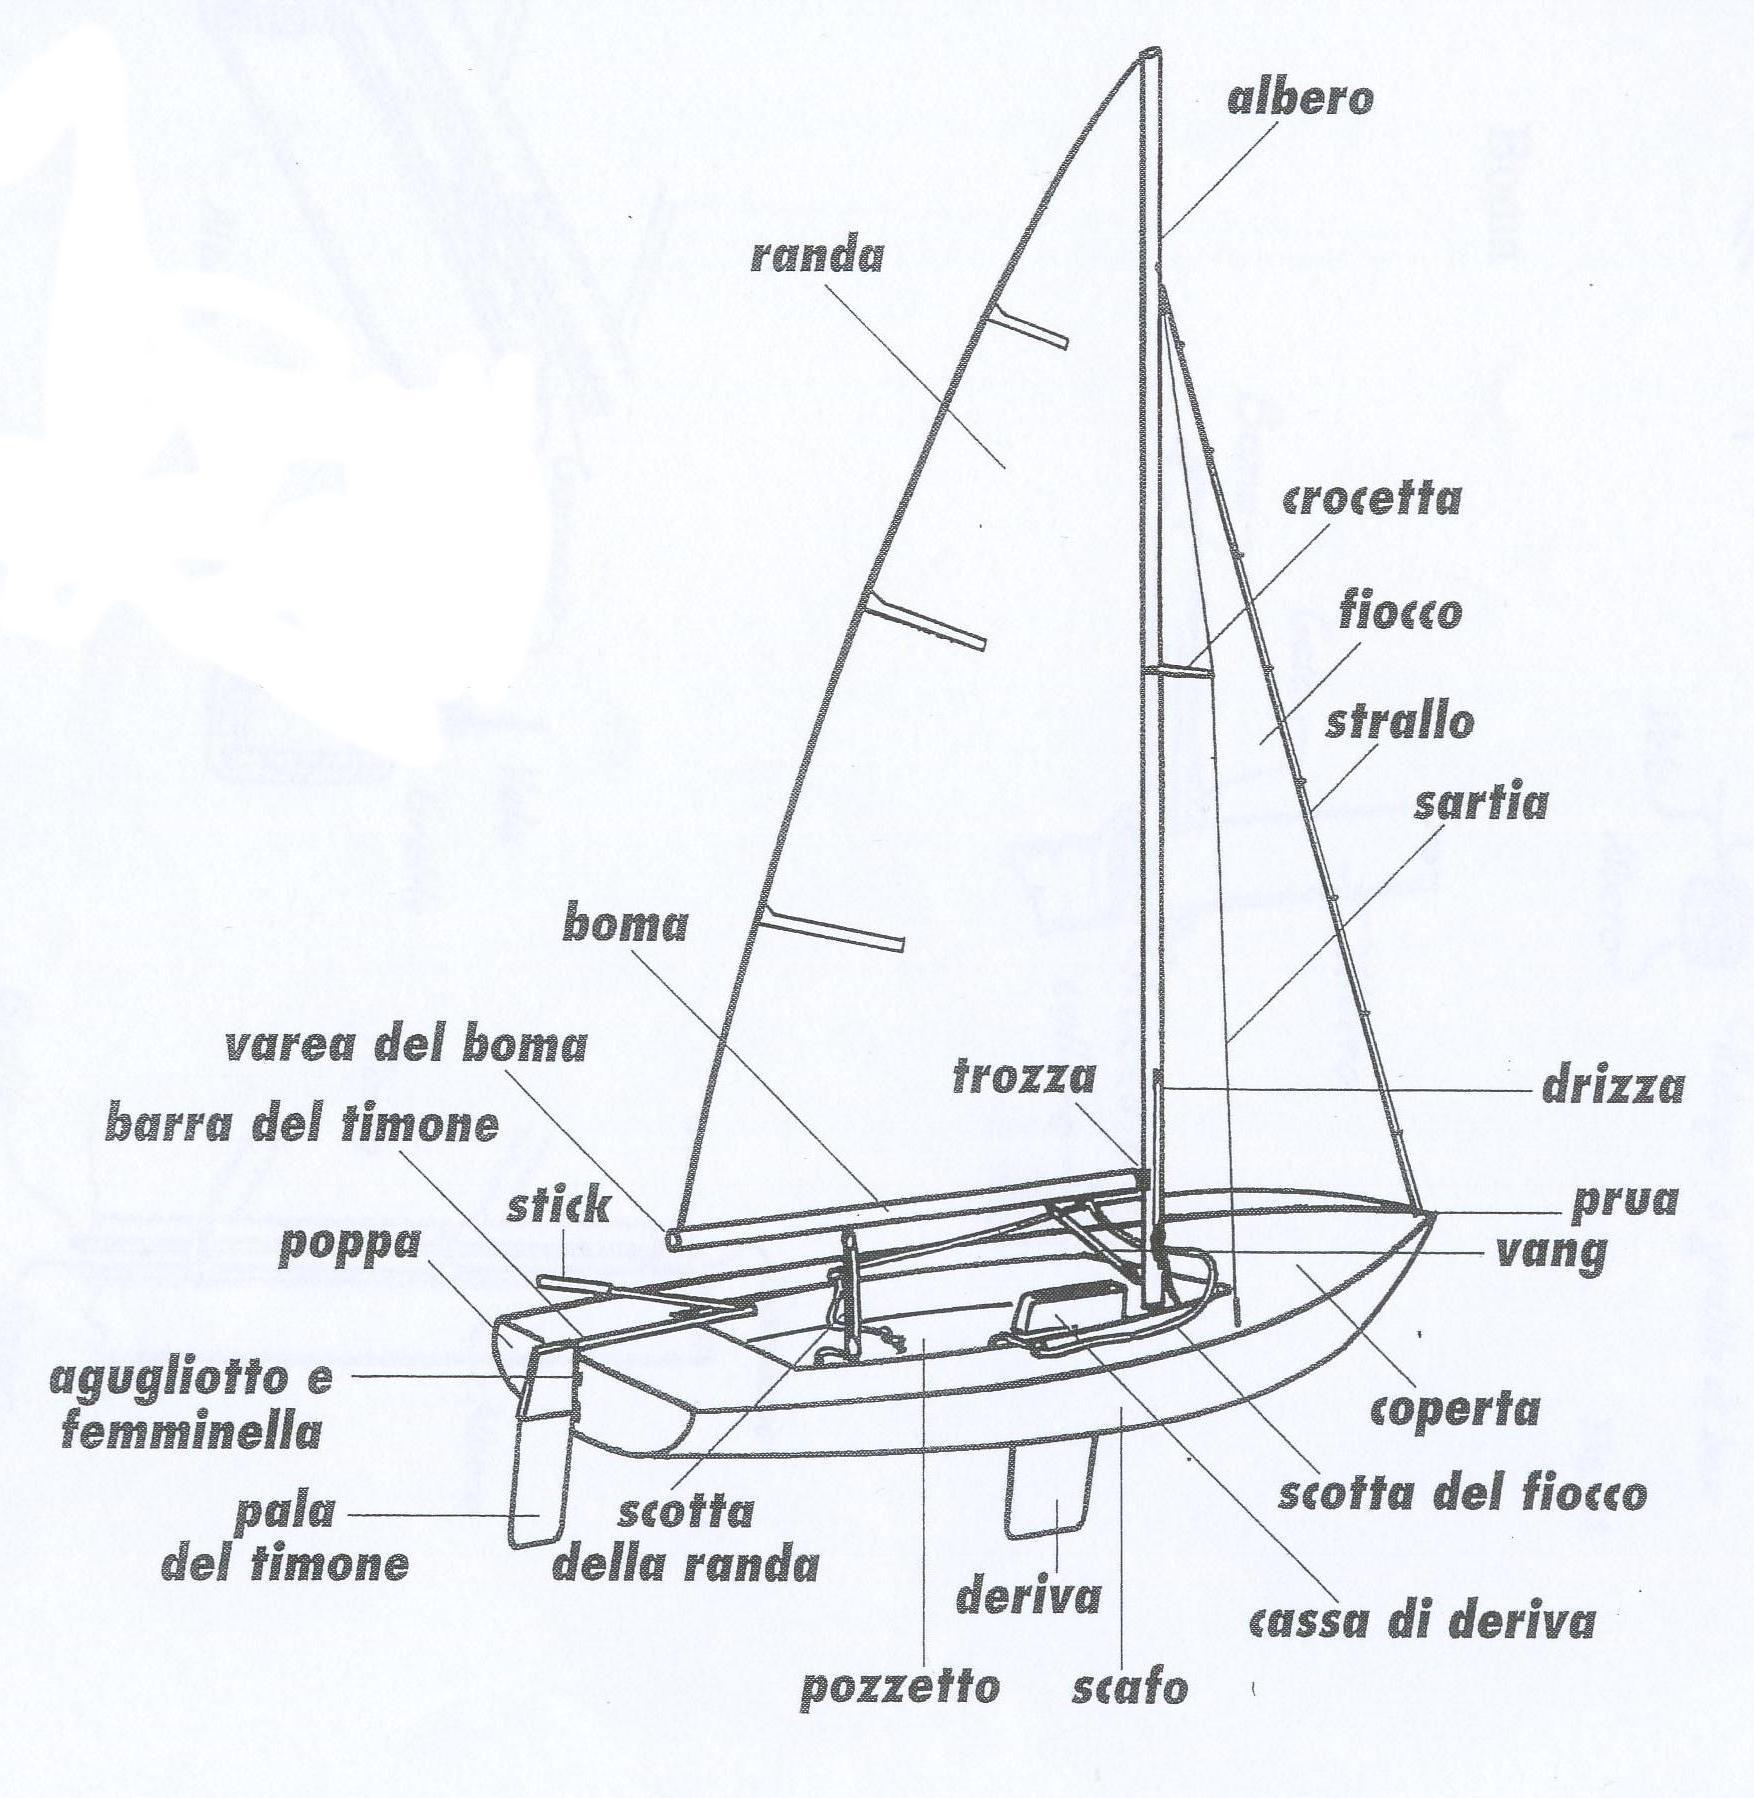 Navigazione a vela for Parti di una barca a vela